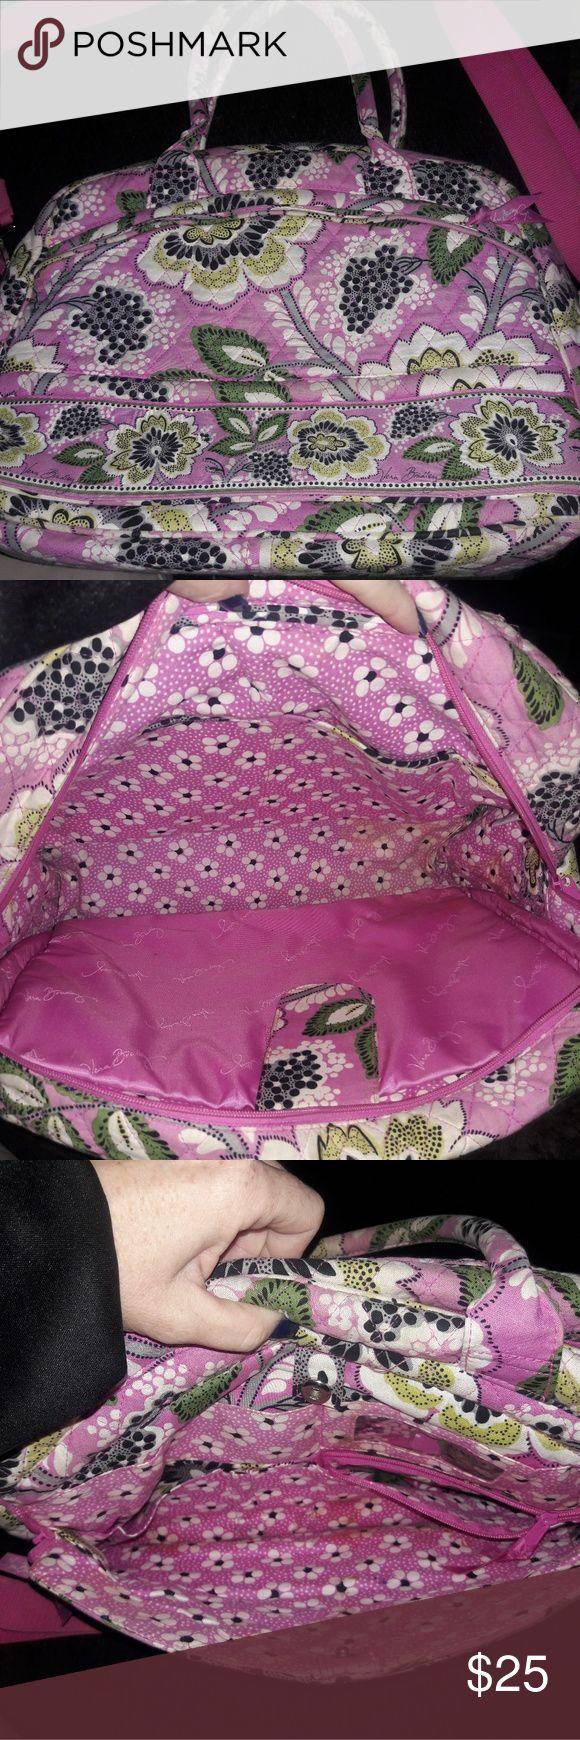 Vera Bradley laptop bag, large shoulder strap, Perfect for school work etc excellent shape and a super cute pink pattern. Vera Bradley Bags Laptop Bags